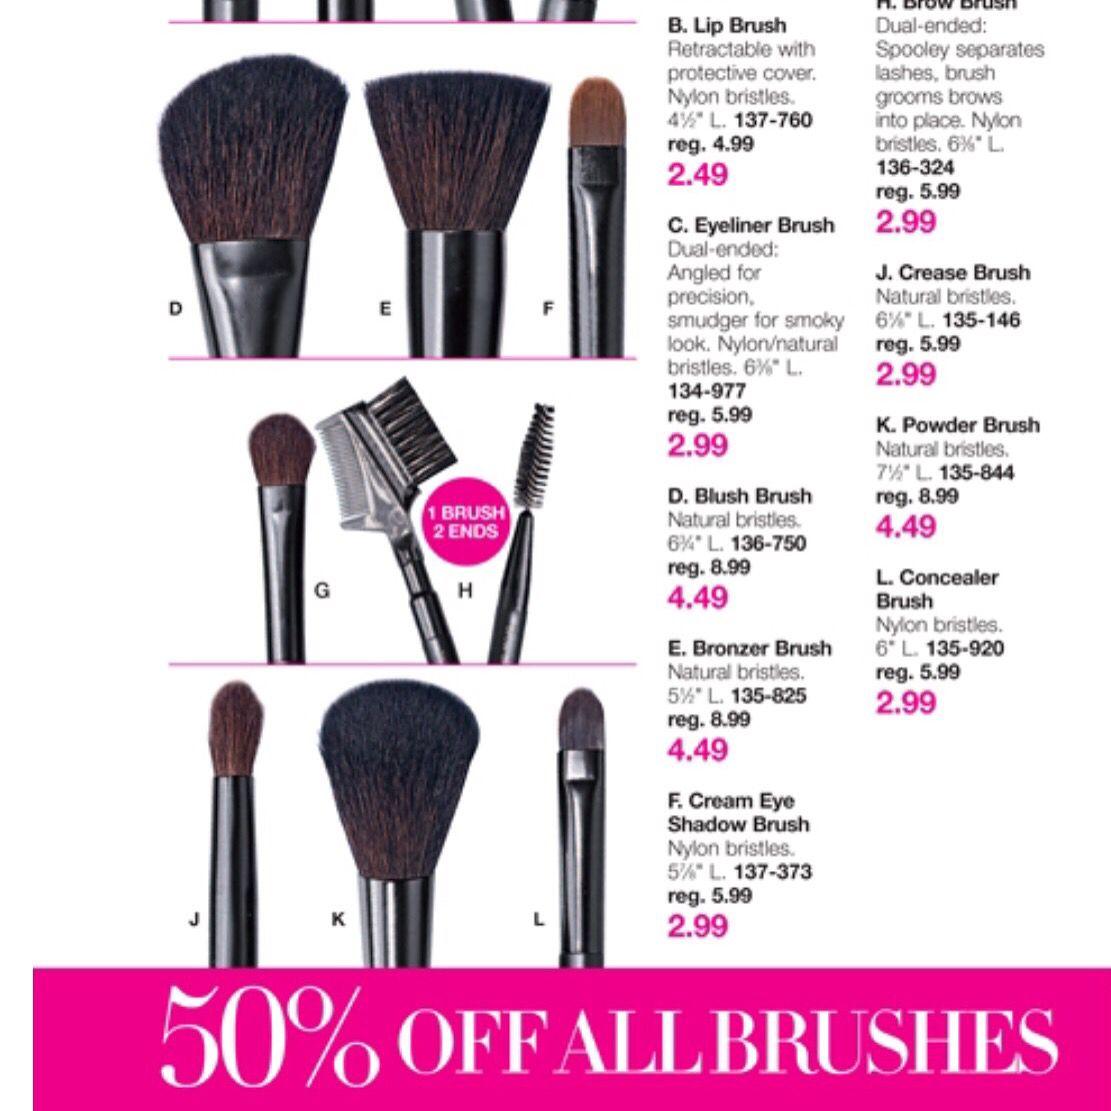 50% off on all #avon #makeup #brushes. Order @ www.YourAvon.com/Nondas #avonrep #avononline #avonbeautyinsider #makeup #sale #shop #onlineshopping